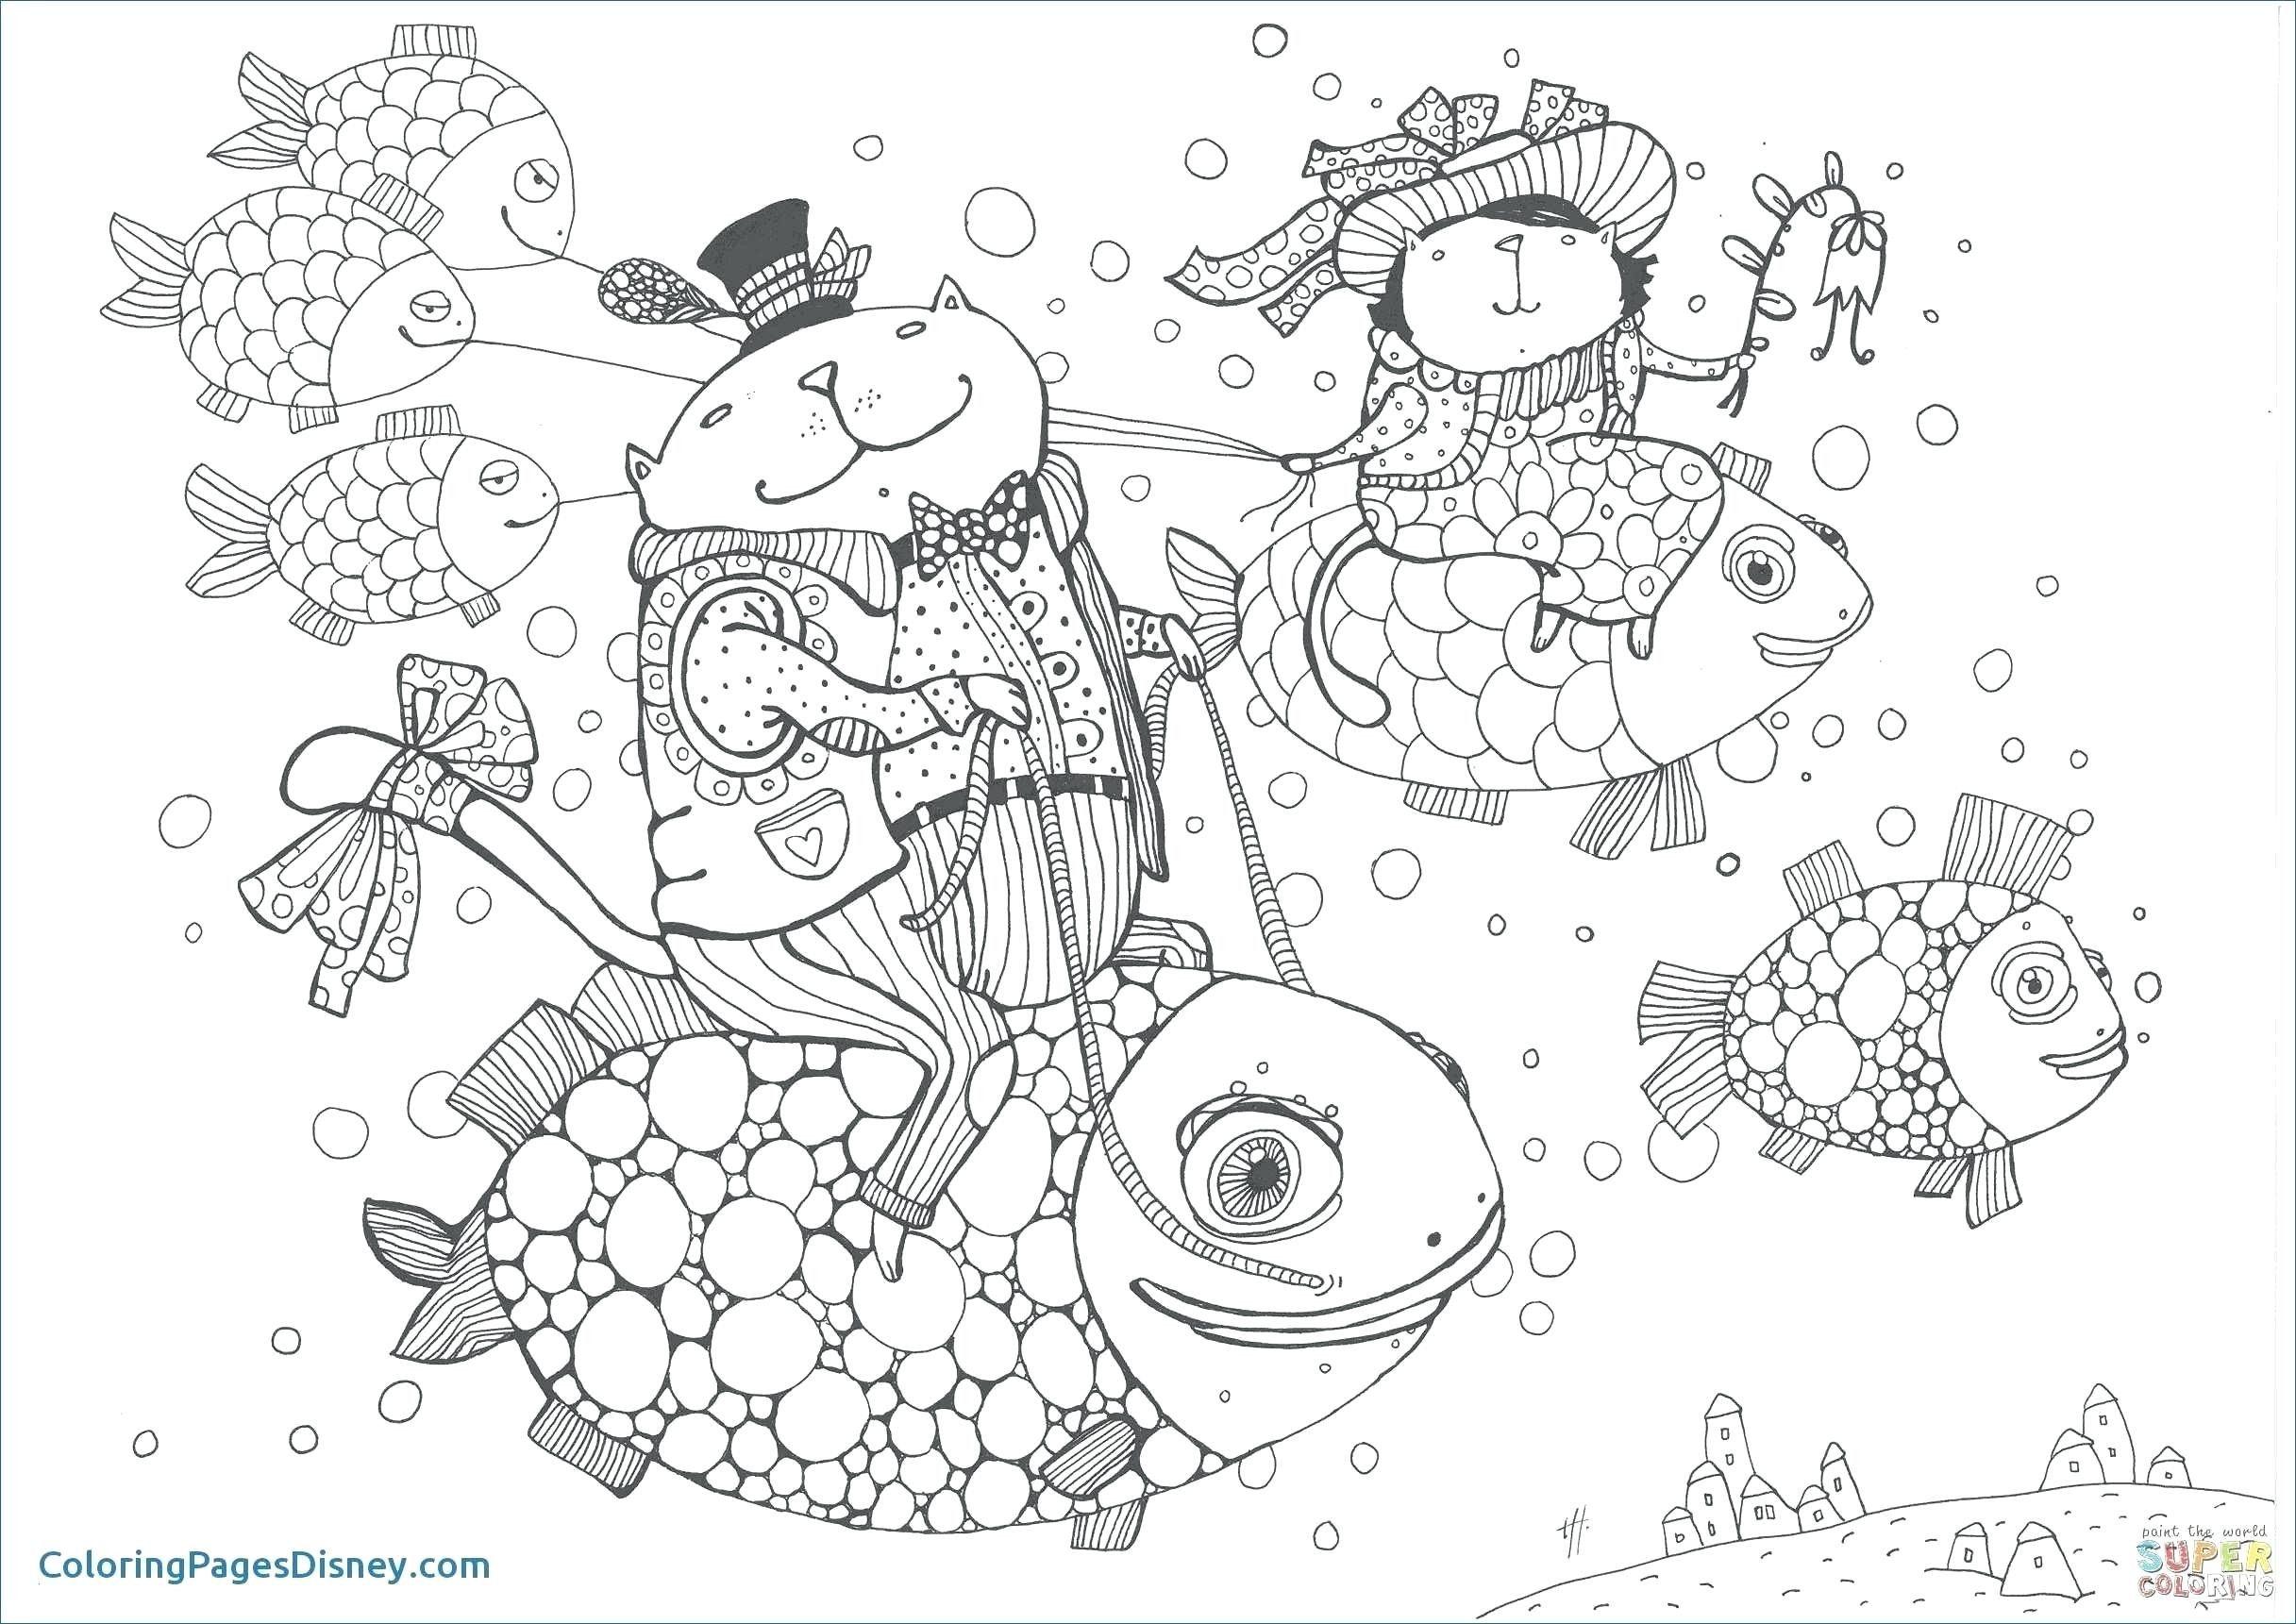 5 Kindergarten Worksheets Subtraction Coloring In 2020 Animal Coloring Pages Bear Coloring Pages Superhero Coloring Pages [ 1721 x 2433 Pixel ]